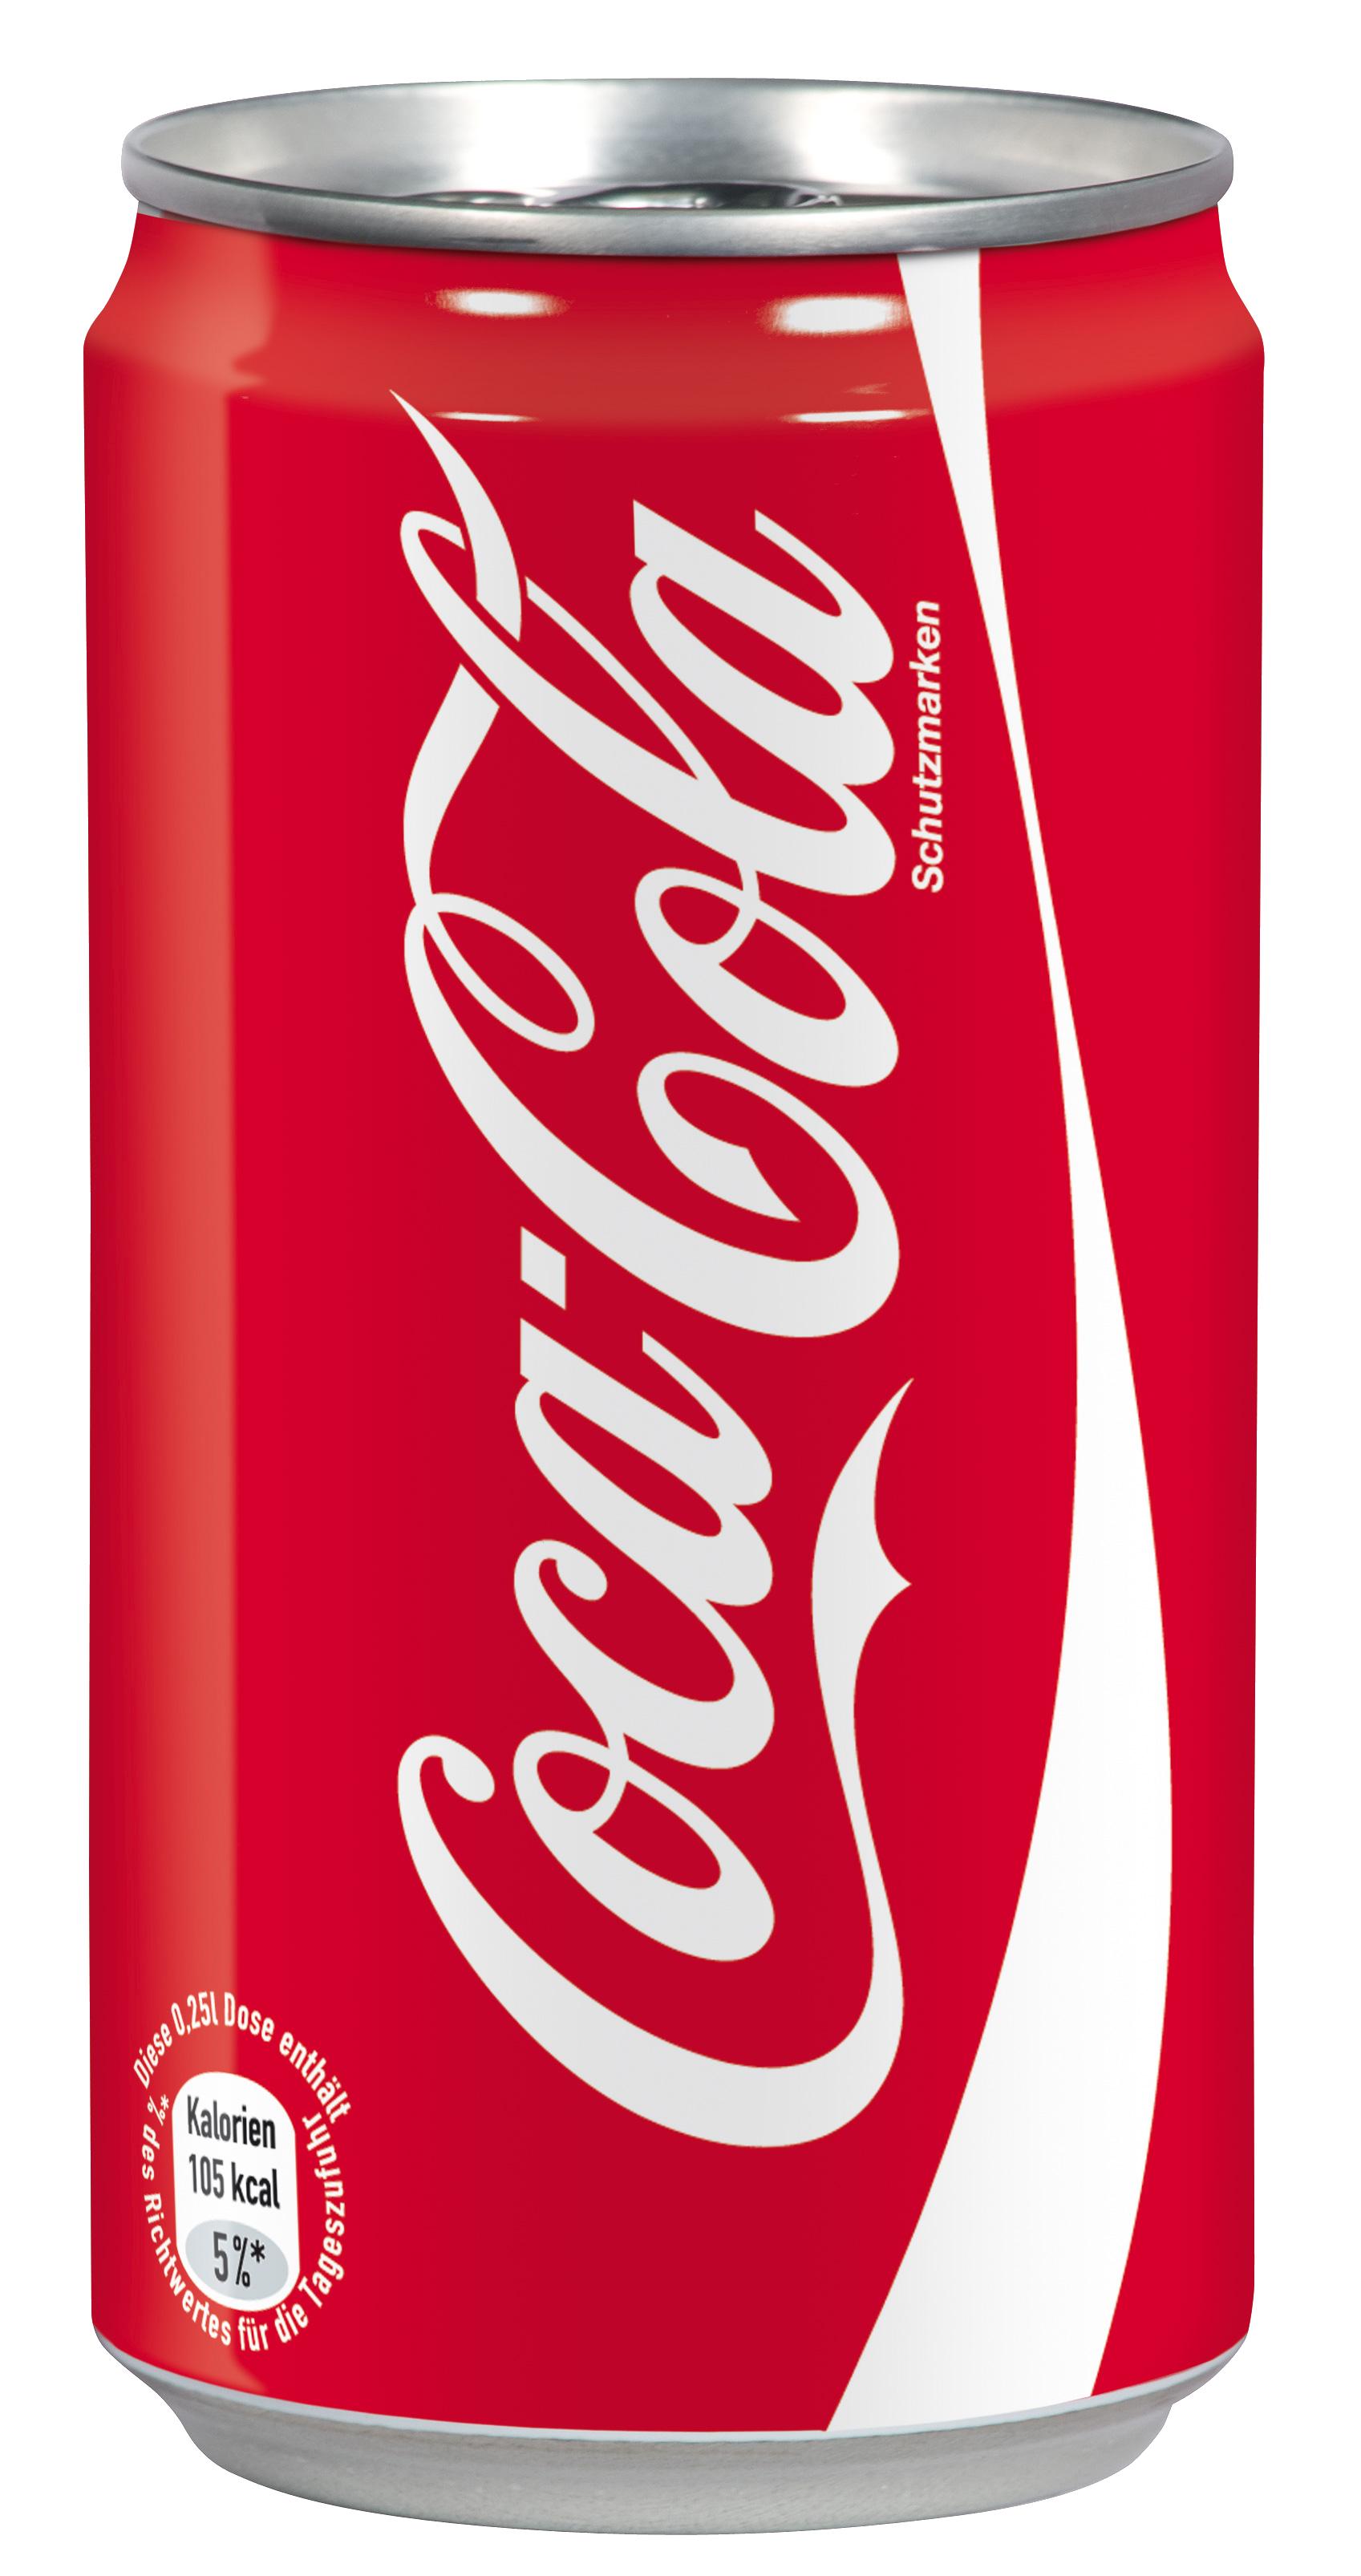 Image download free clipart. Coca cola bottle png